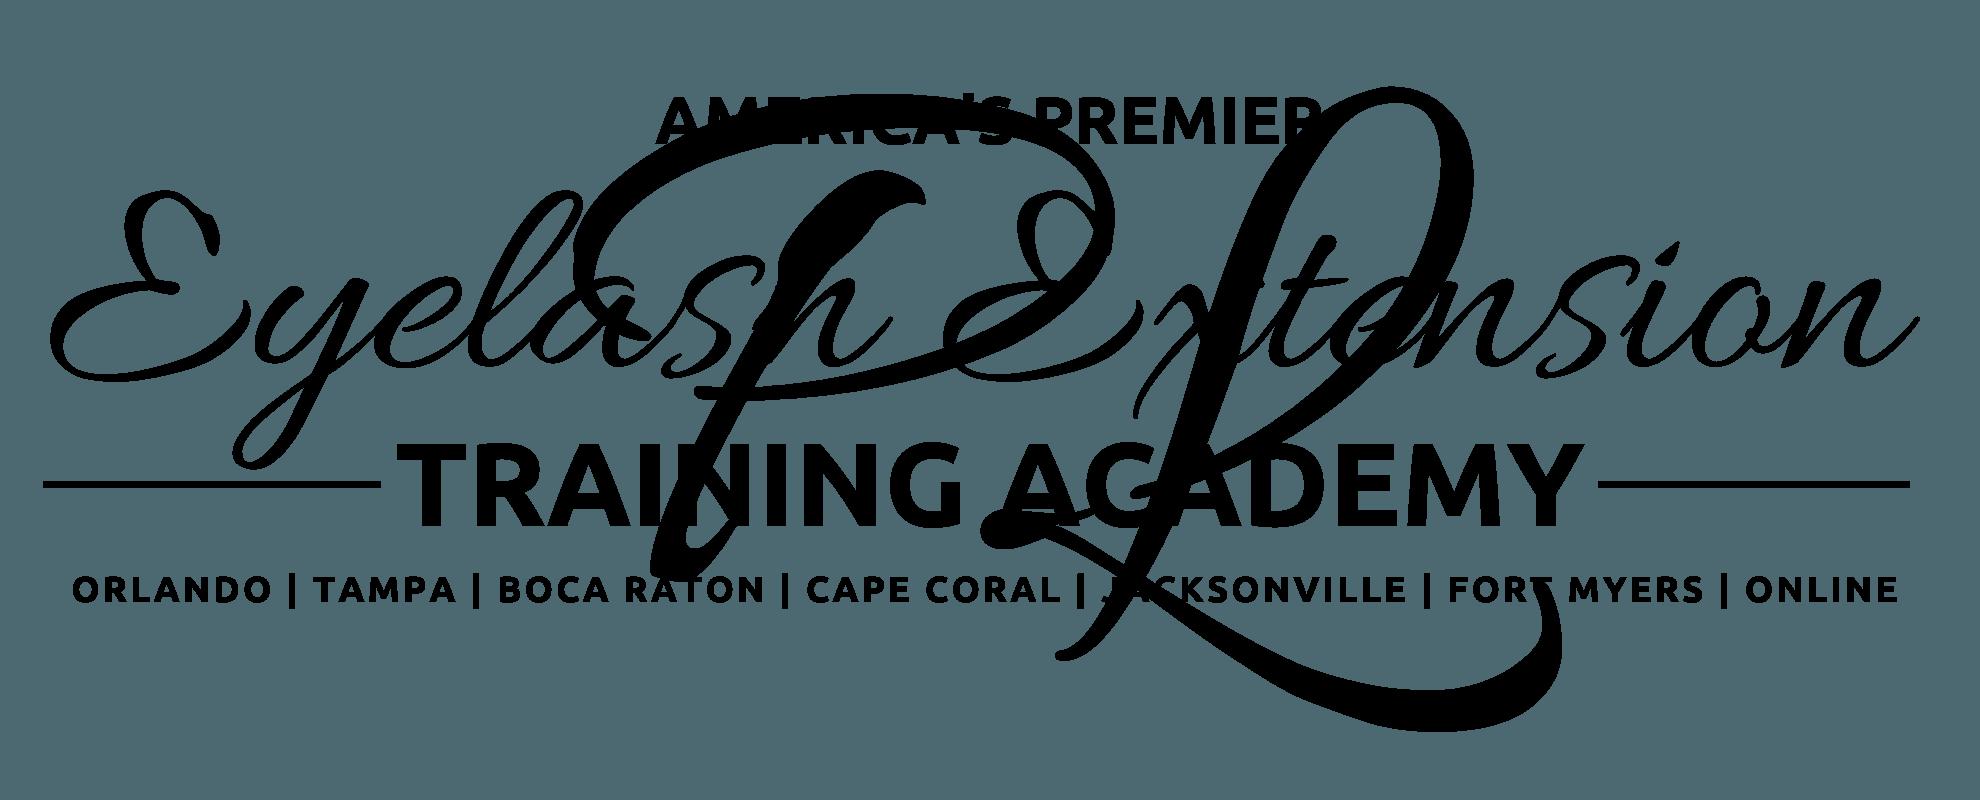 Pearl Lash Americas Premier Eyelash Extension Training Academy Tampa Orlando Fort Myers Cape Coral Boca Raton Jacksonville Online Training